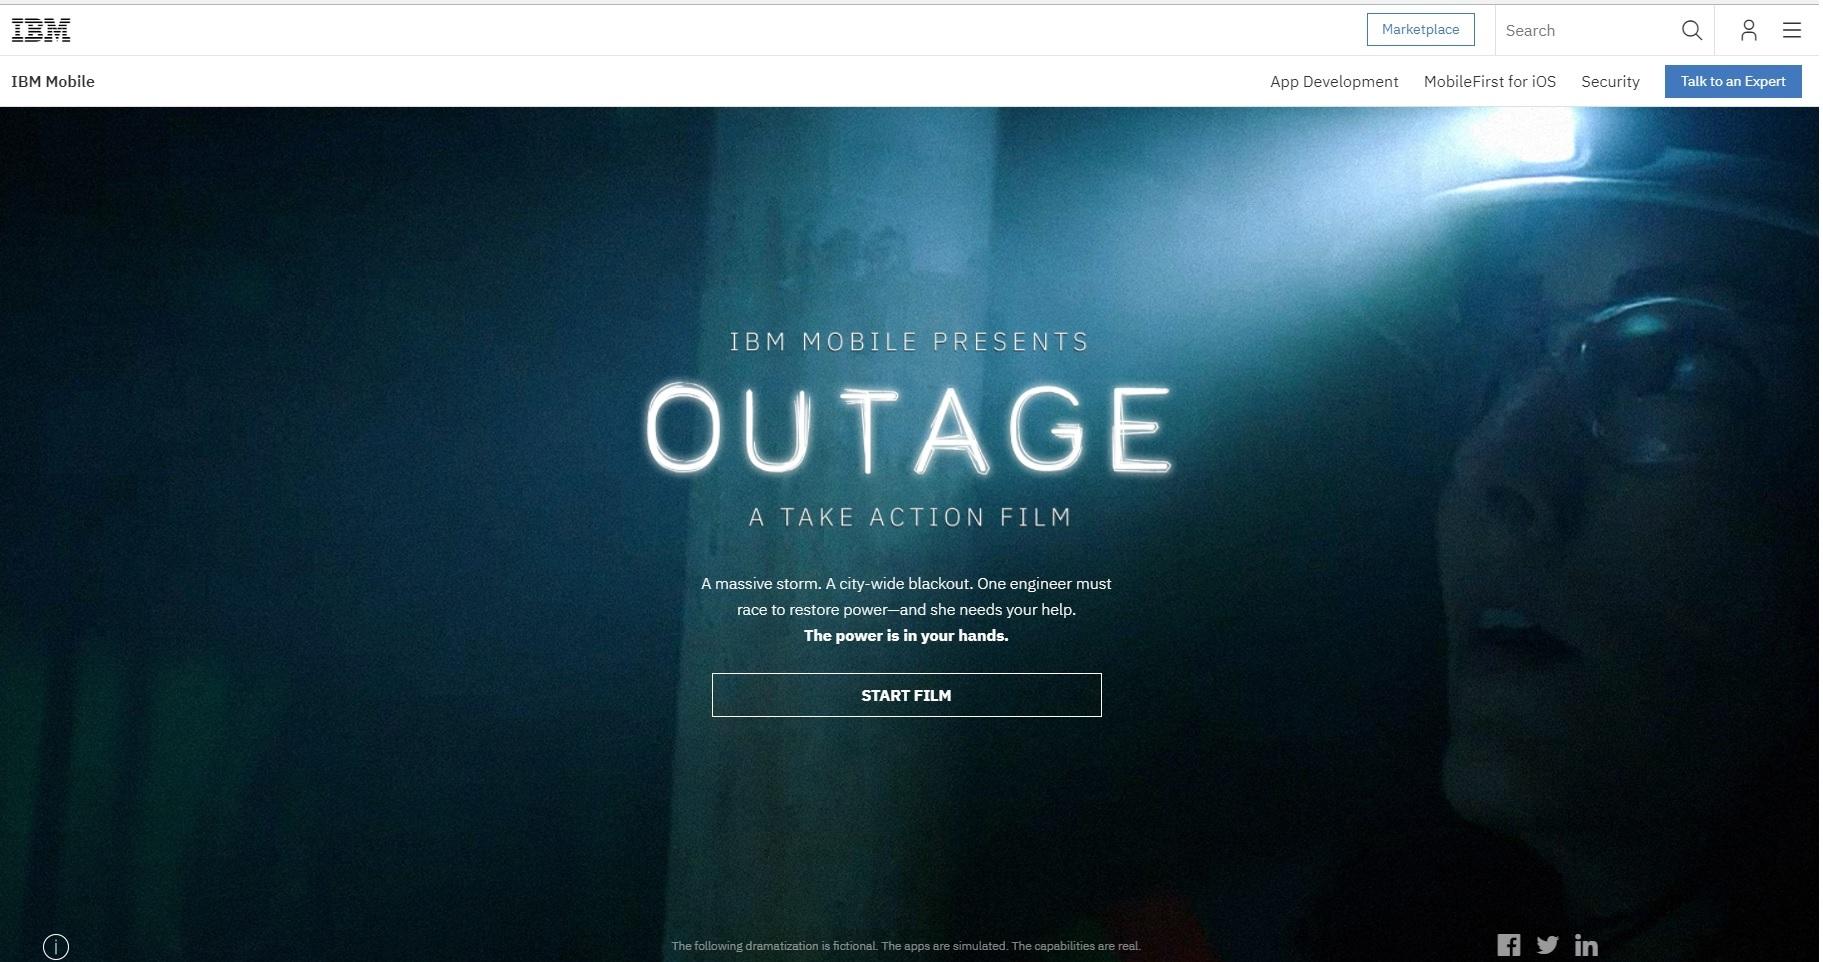 IBM OUTAGE film home